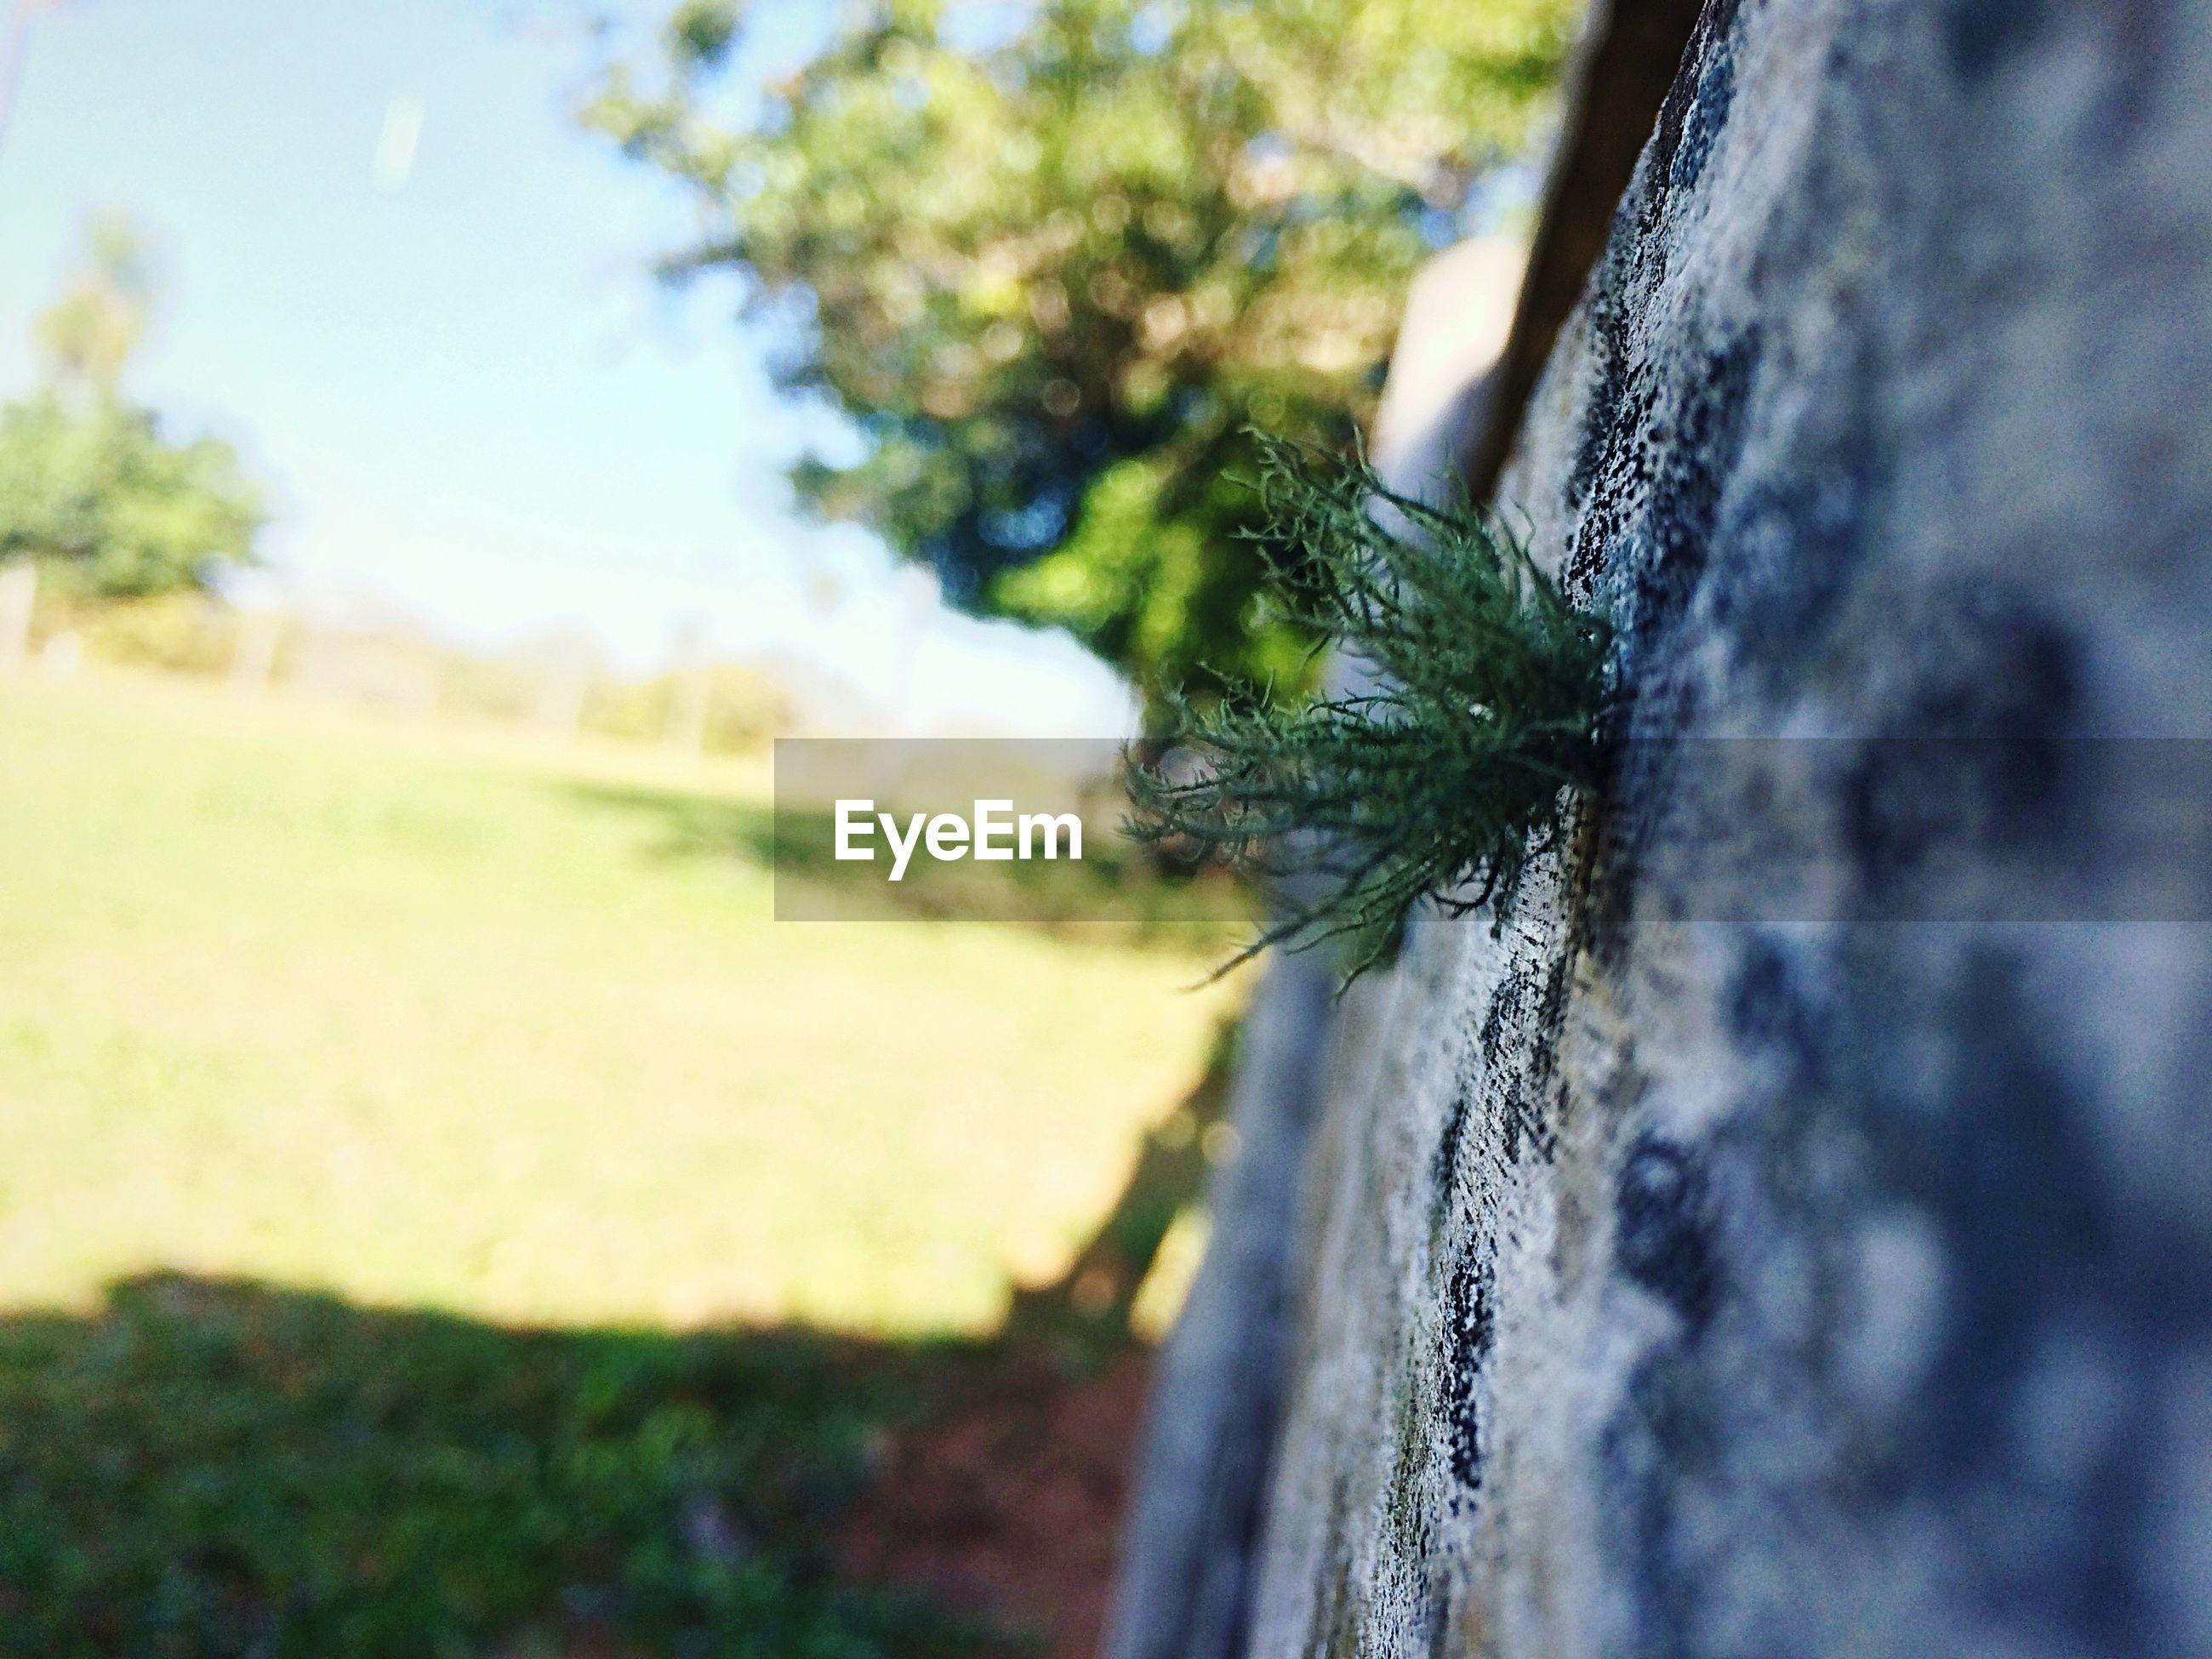 CLOSE-UP OF CATERPILLAR ON TREE